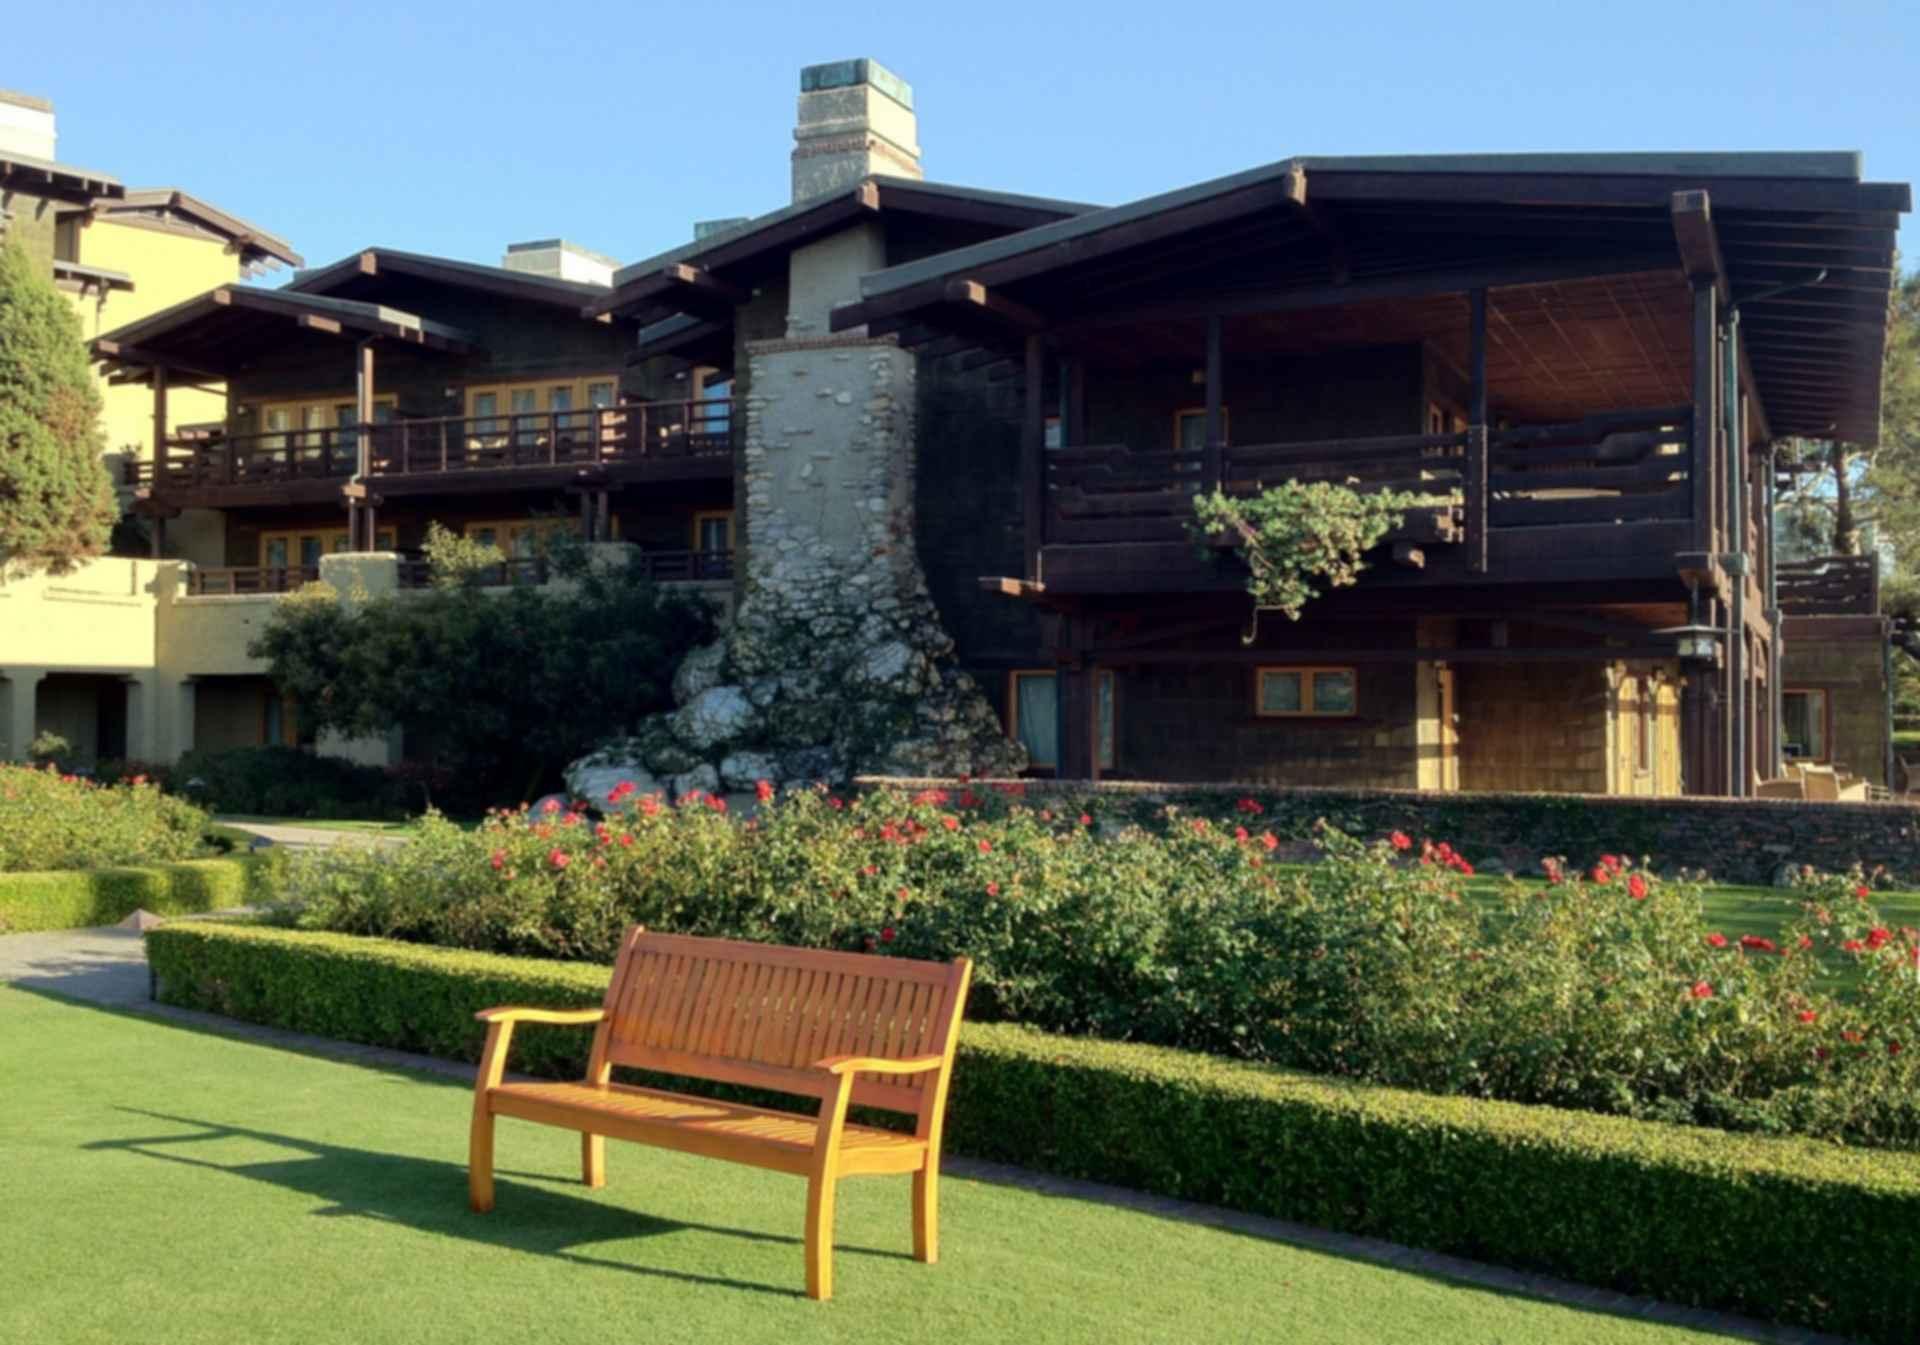 Lodge at Torrey Pines - Exterior/Gardens